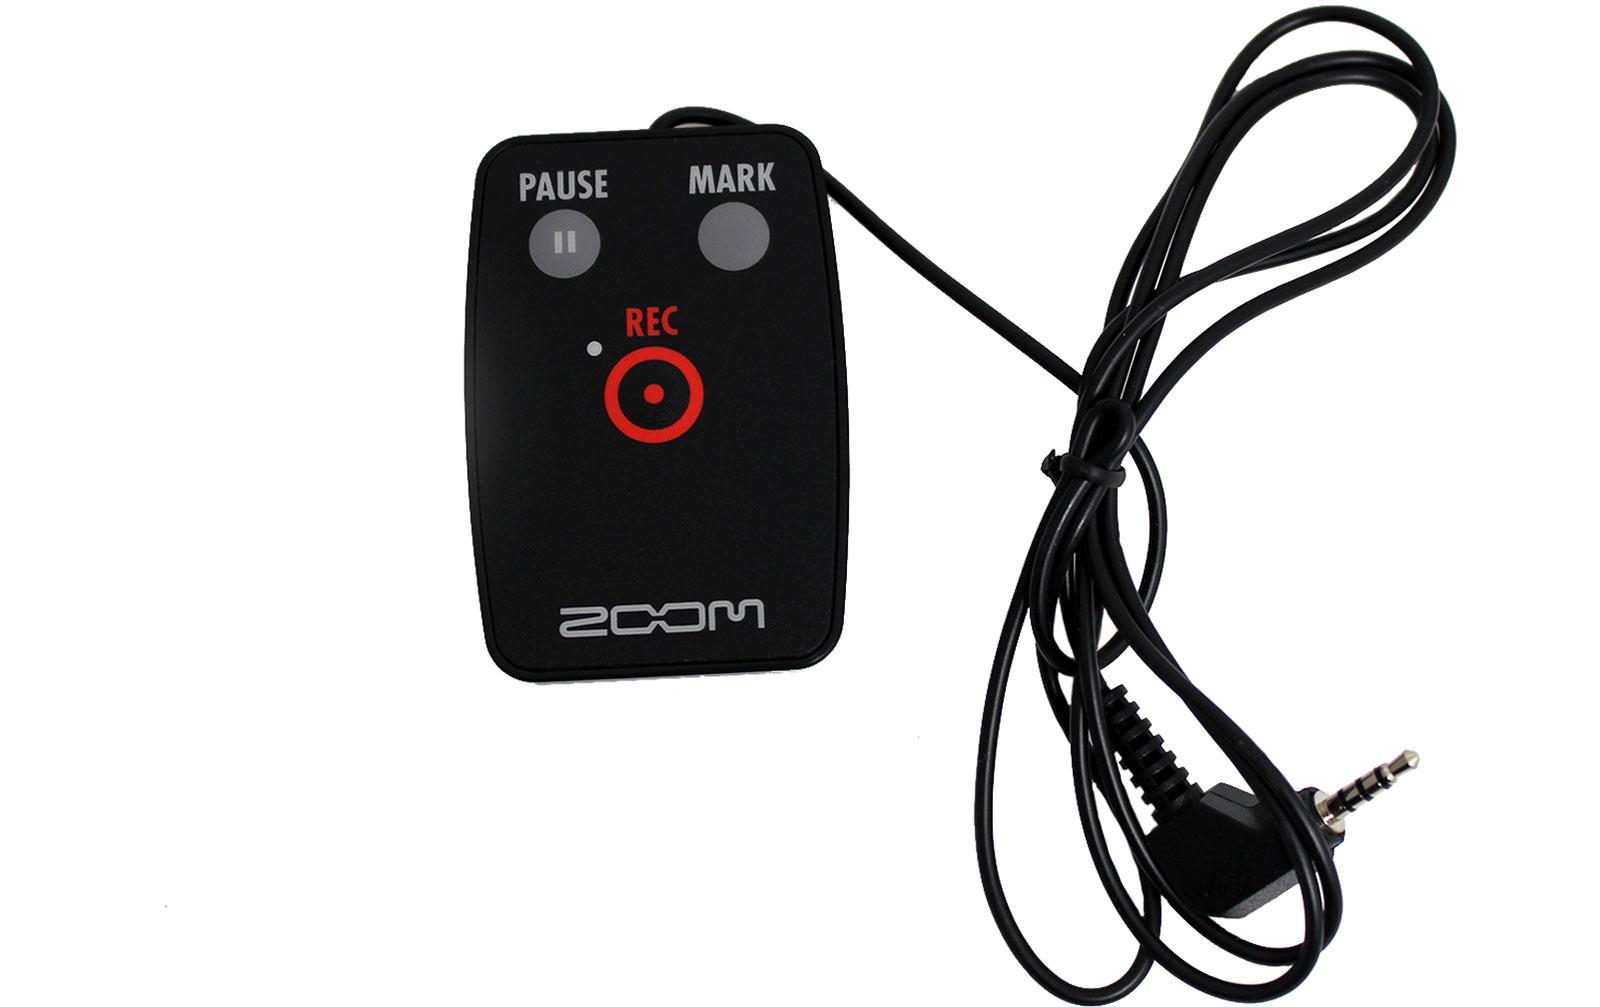 zoom-rc2-remote-controller-fa-r-h2n